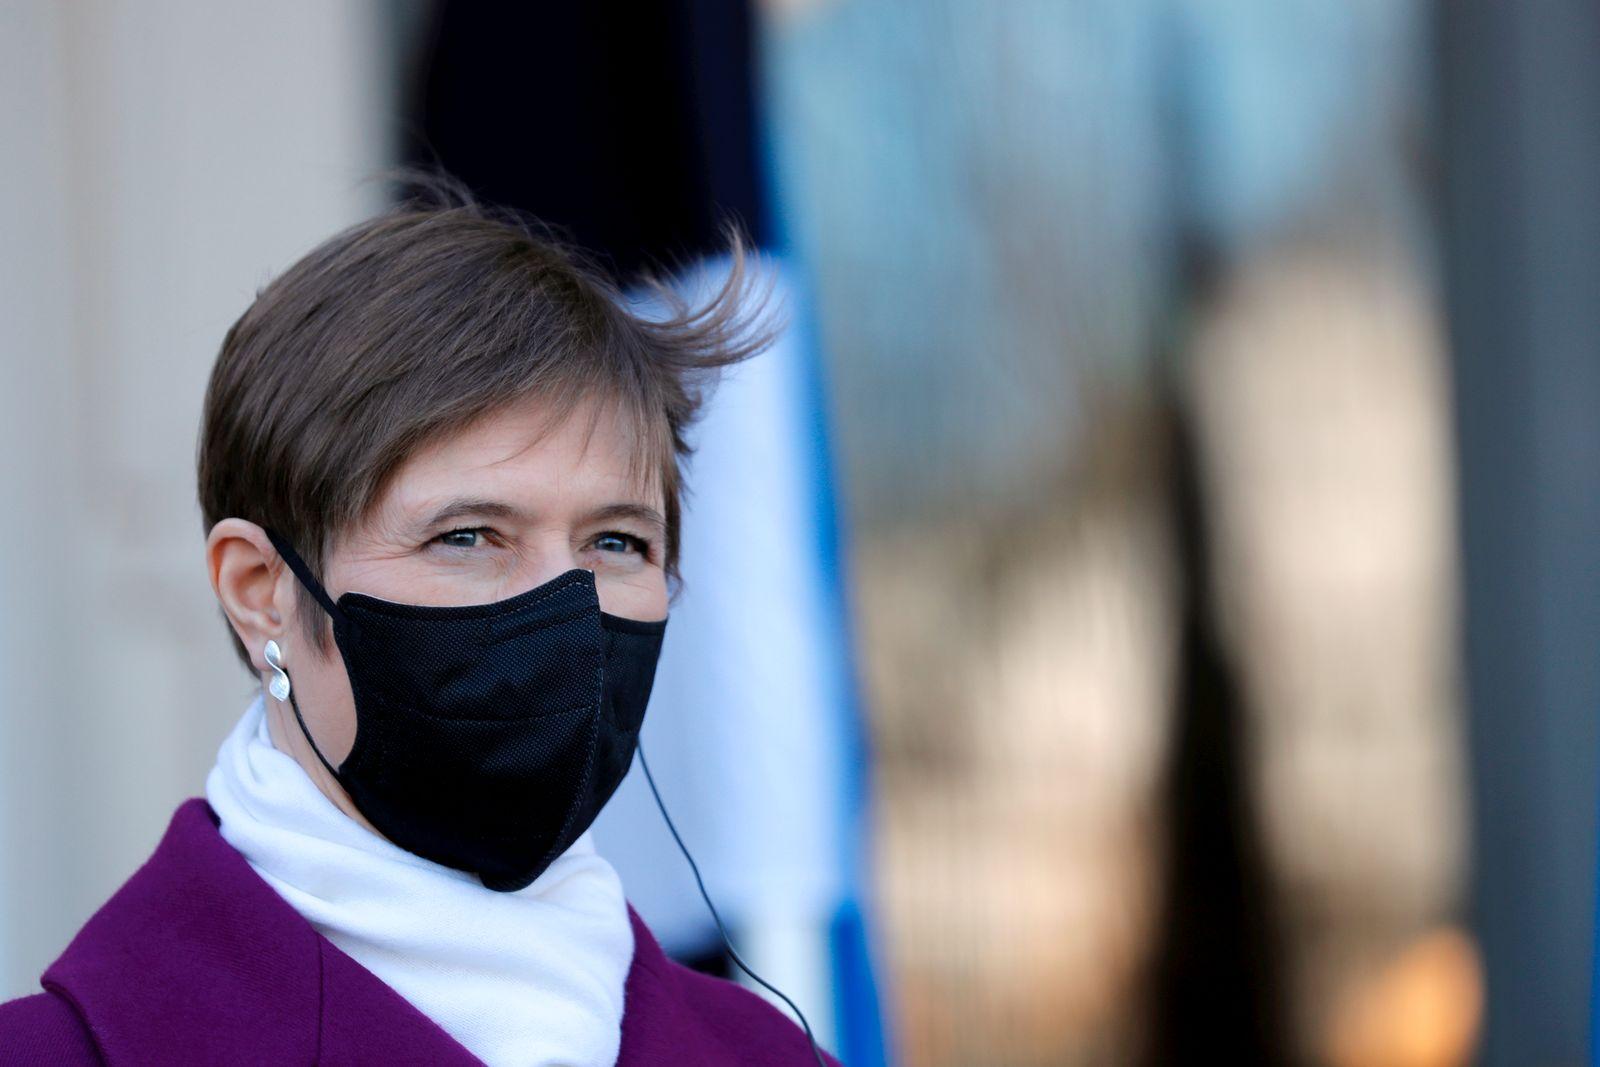 Estonian president Kersti Kaljulaid visits Latvia